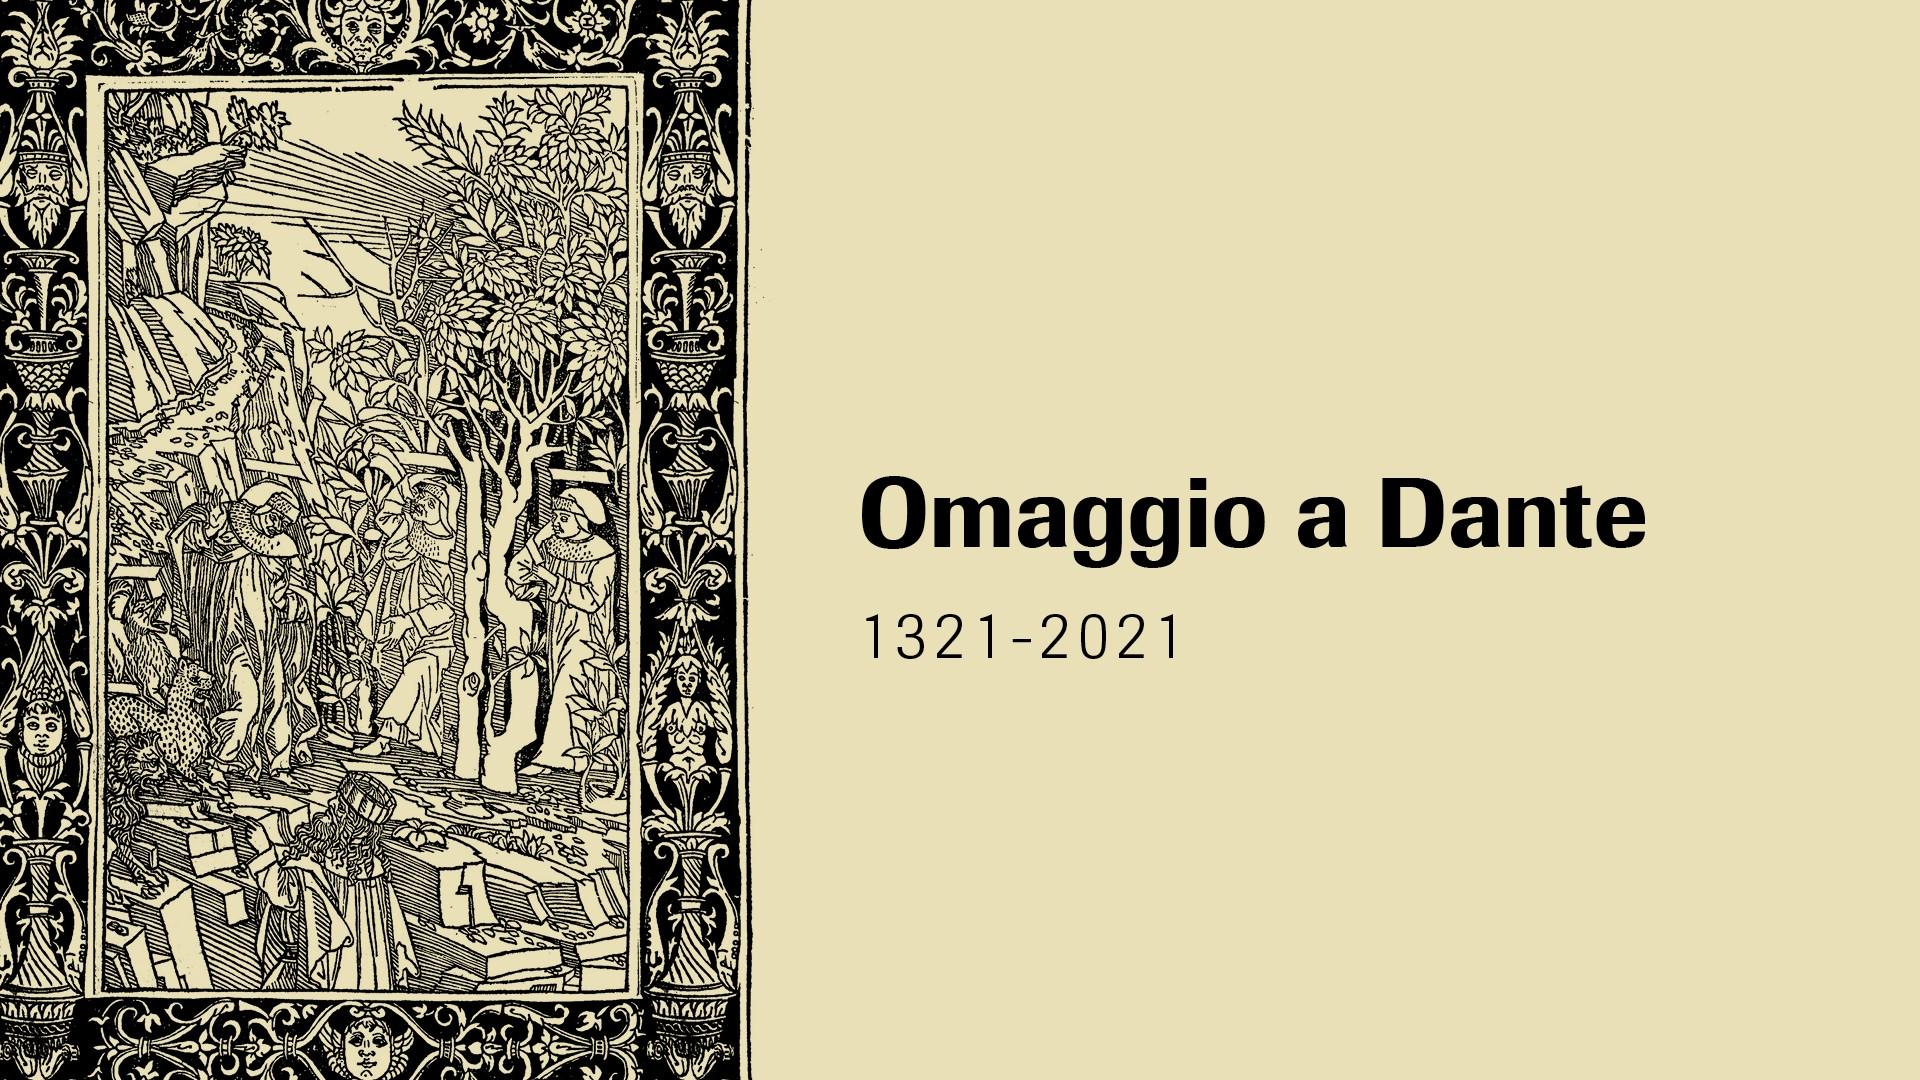 http://www.icom-italia.org/wp-content/uploads/wpforms/10320-faf7ed92f83be88bc622f726ed042c0c/dante2-b0c80b72b88805676fa8dd4cfdd67b52.jpg